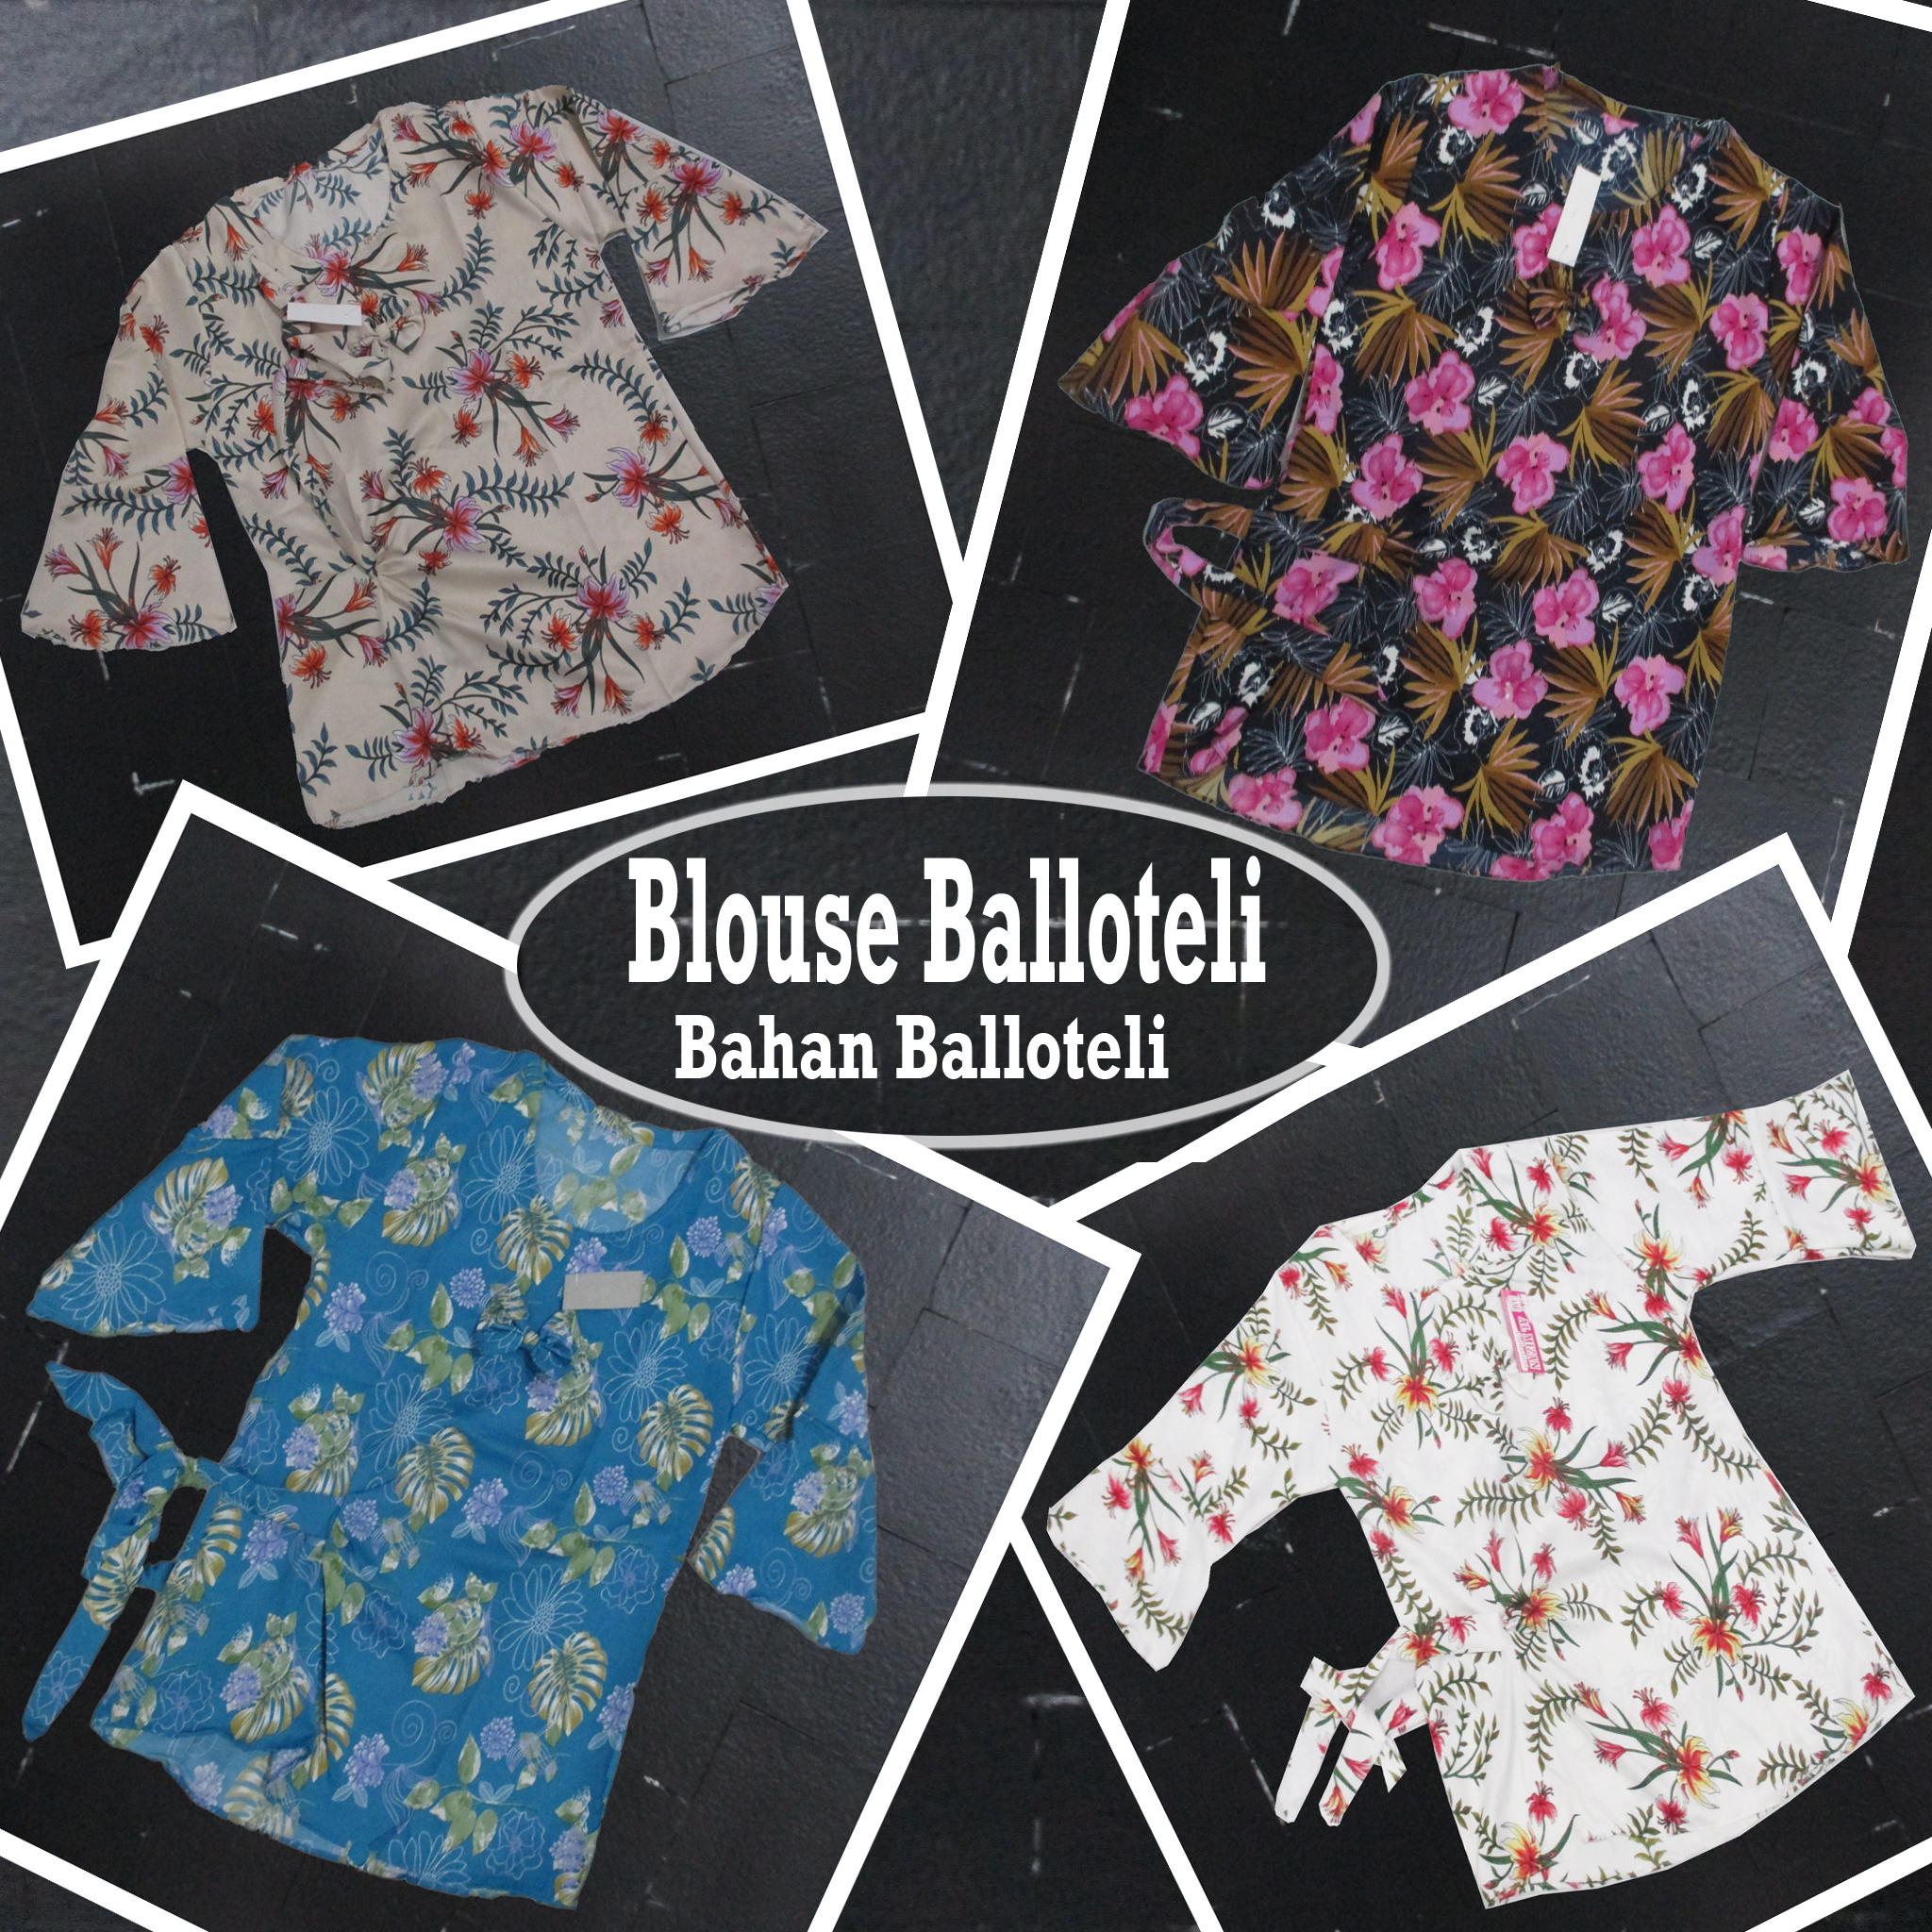 Pusat Grosir Baju Murah Solo Klewer 2019 Grosir Blouse Balloteli Dewasa Murah di Solo 28Ribuan